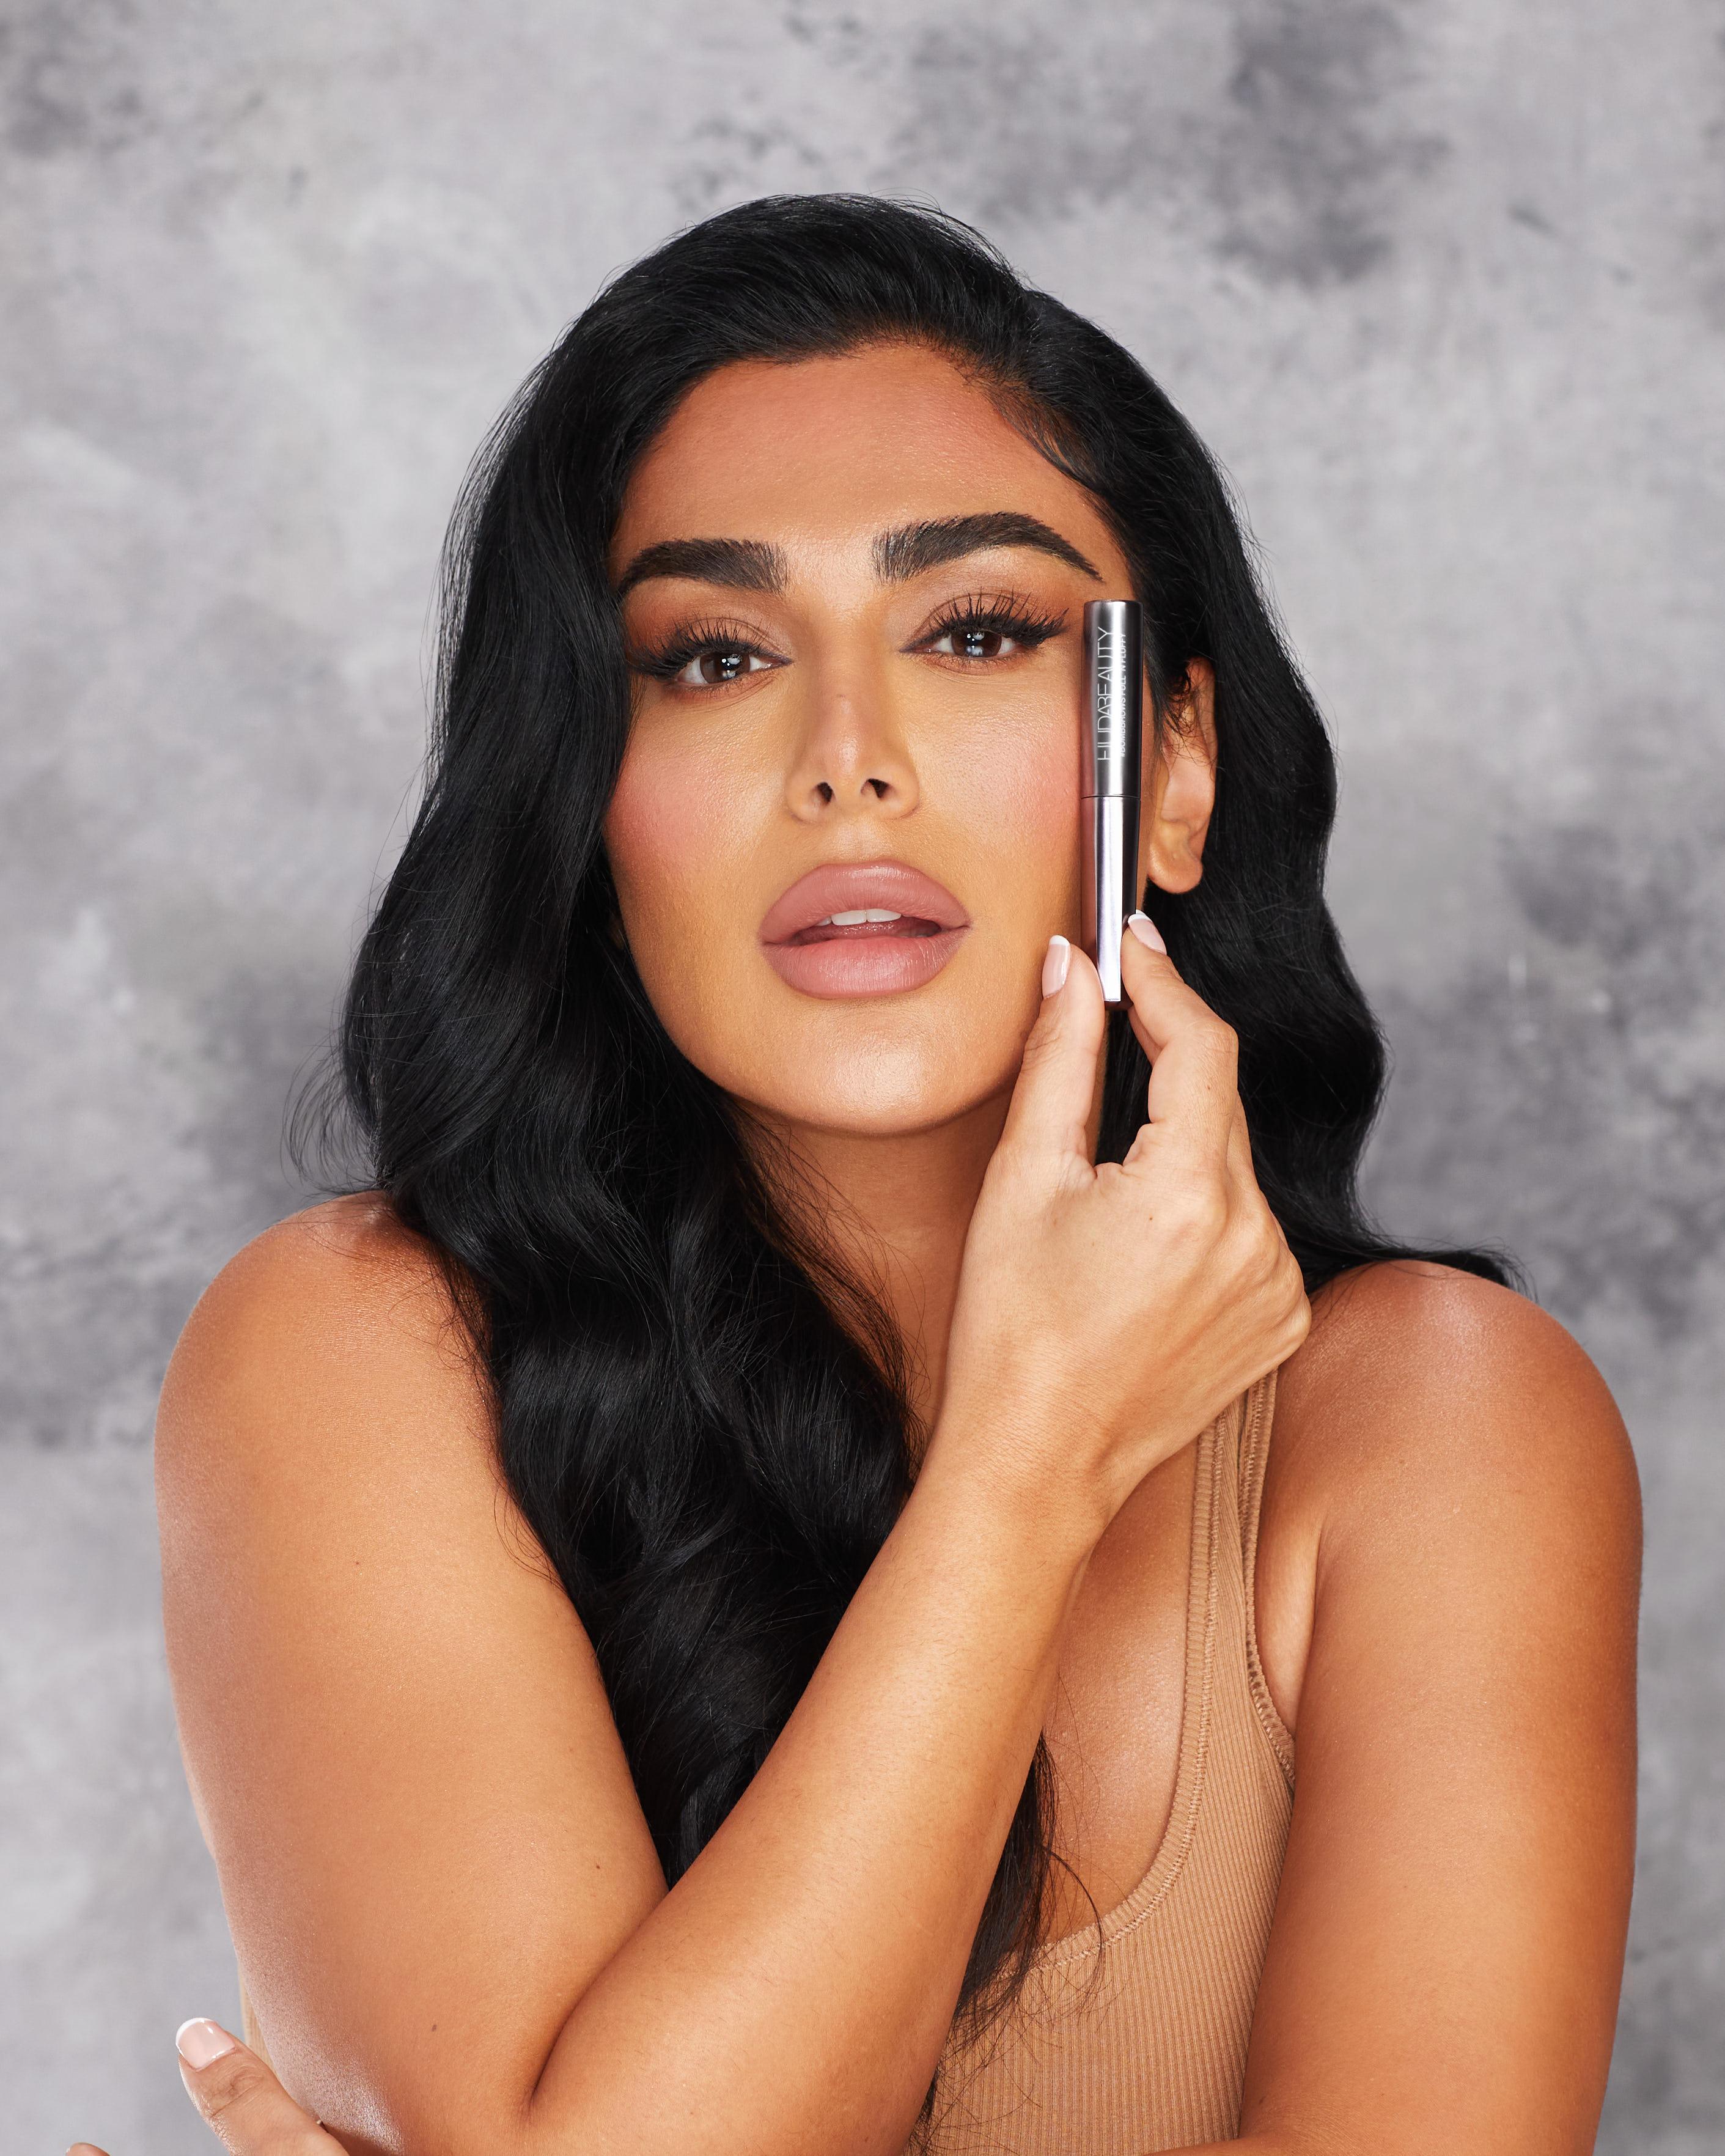 Huda Beauty Bomb Brows Full 'N Fluffy Fiber Gel